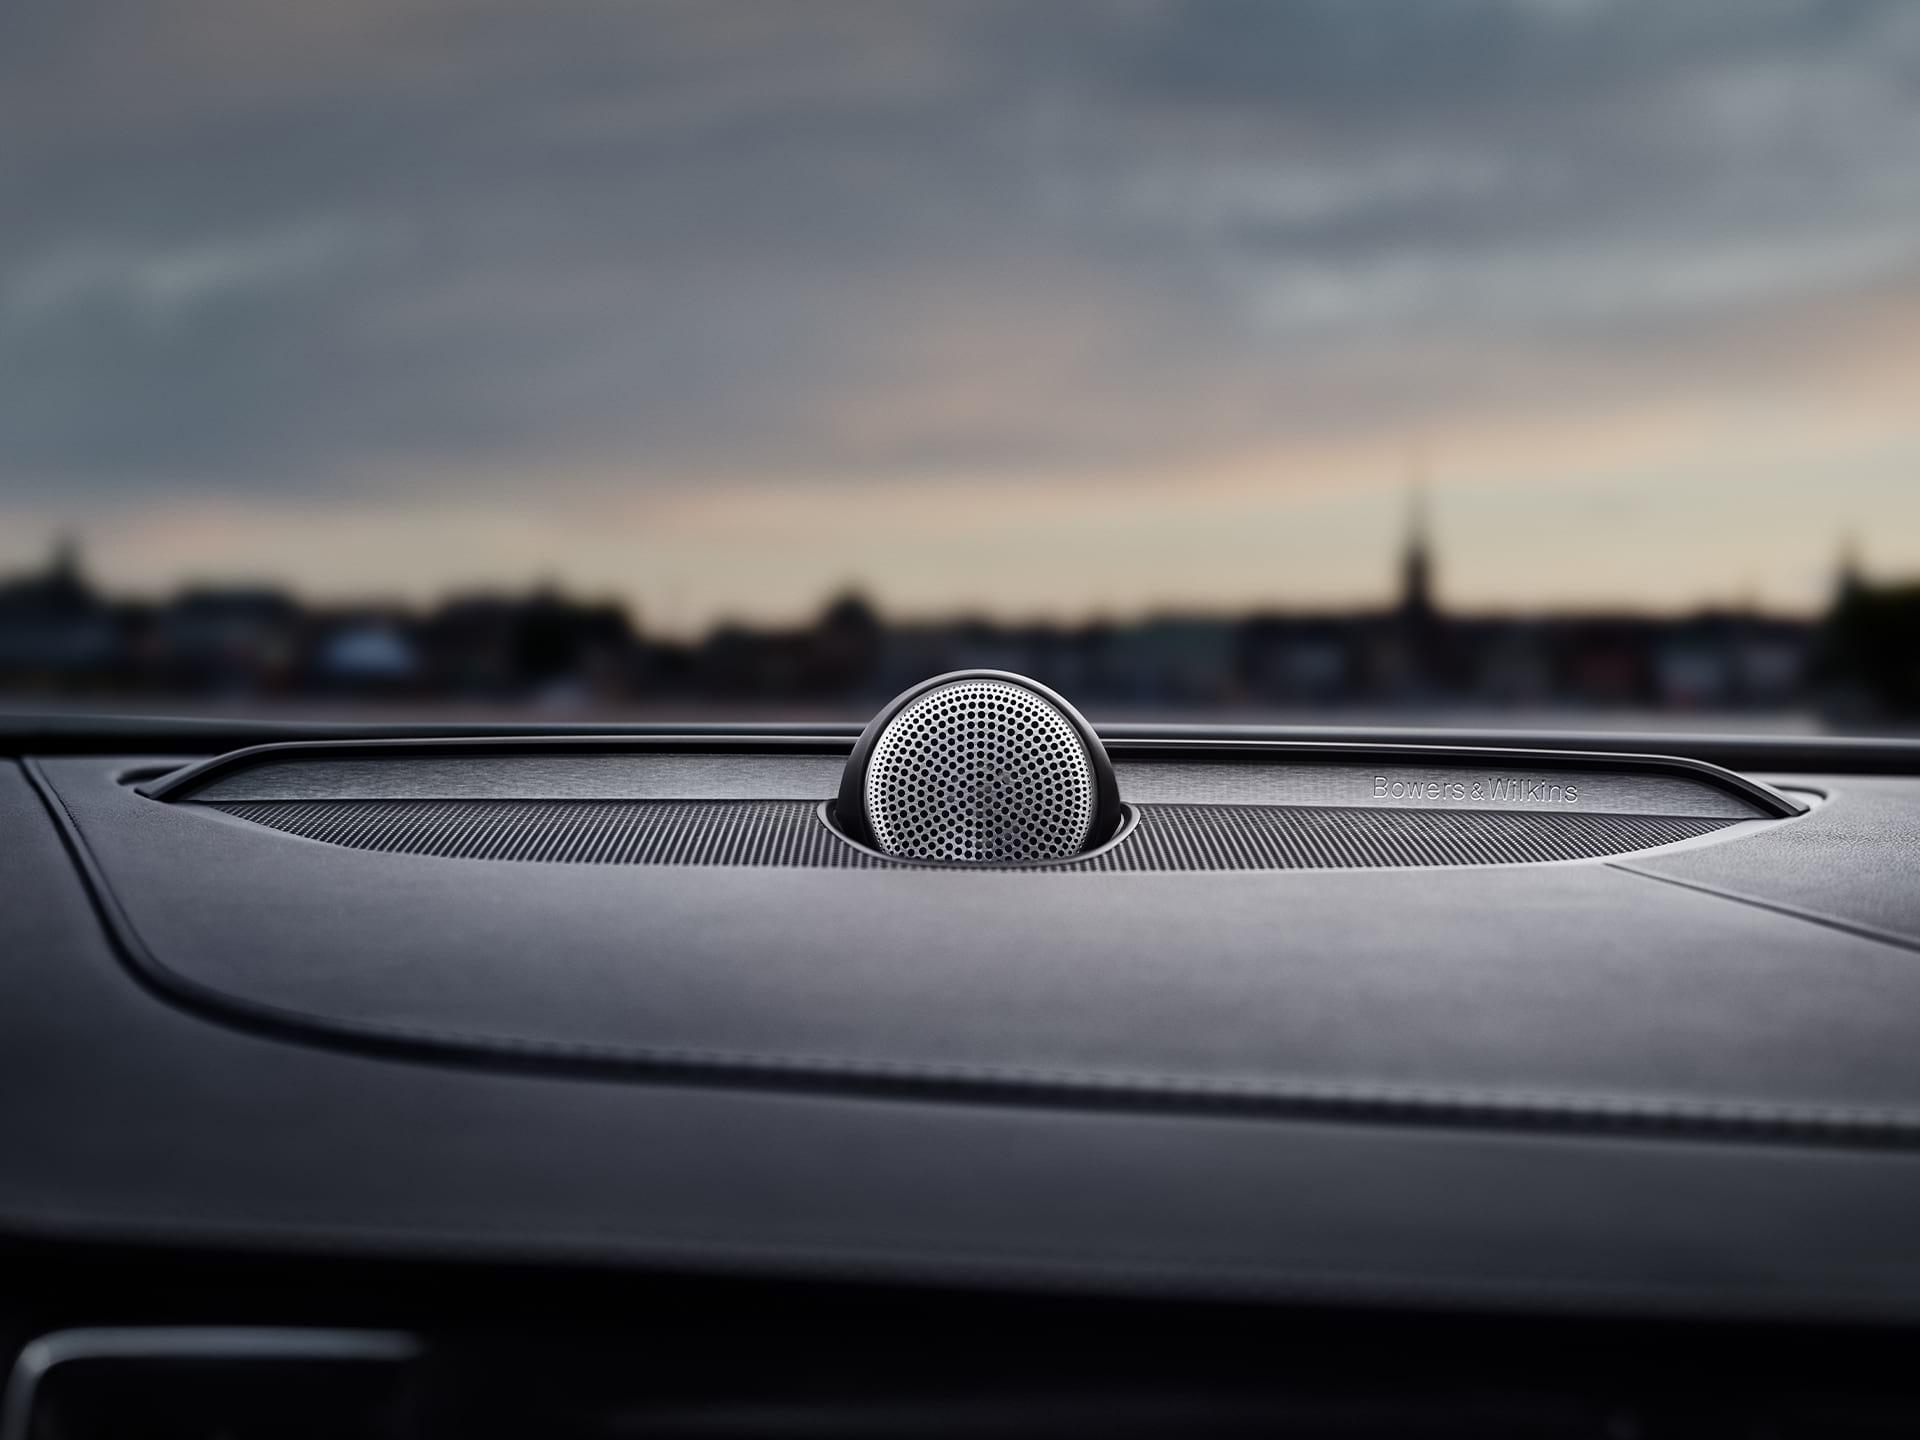 Bowers & Wilkins-högtalare i en Volvo V90.